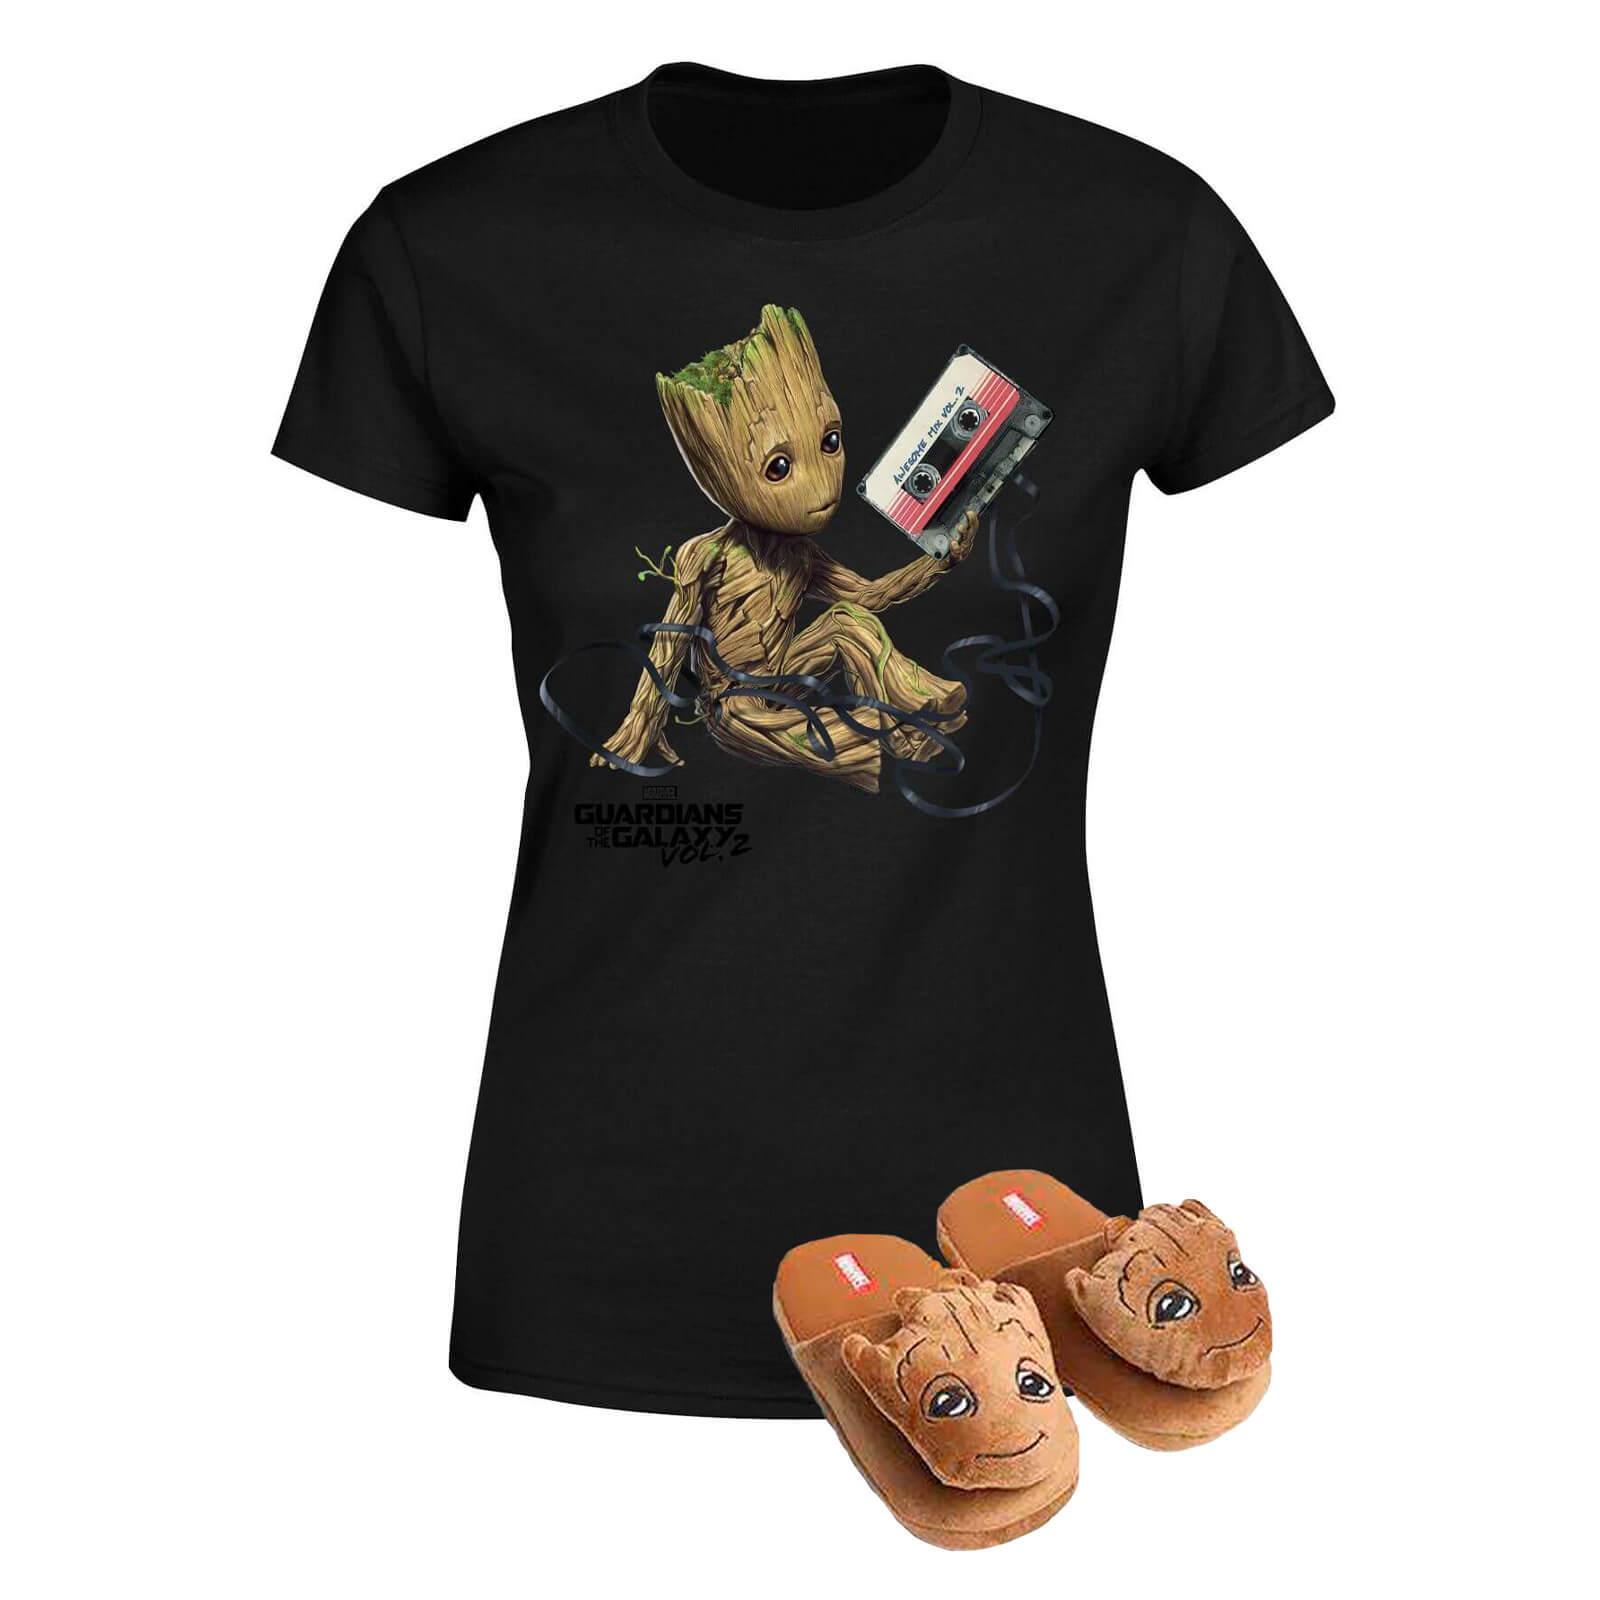 Pack Groot Guardianes de la Galaxia: Camiseta + Pantuflas - Pantuflas L-XL